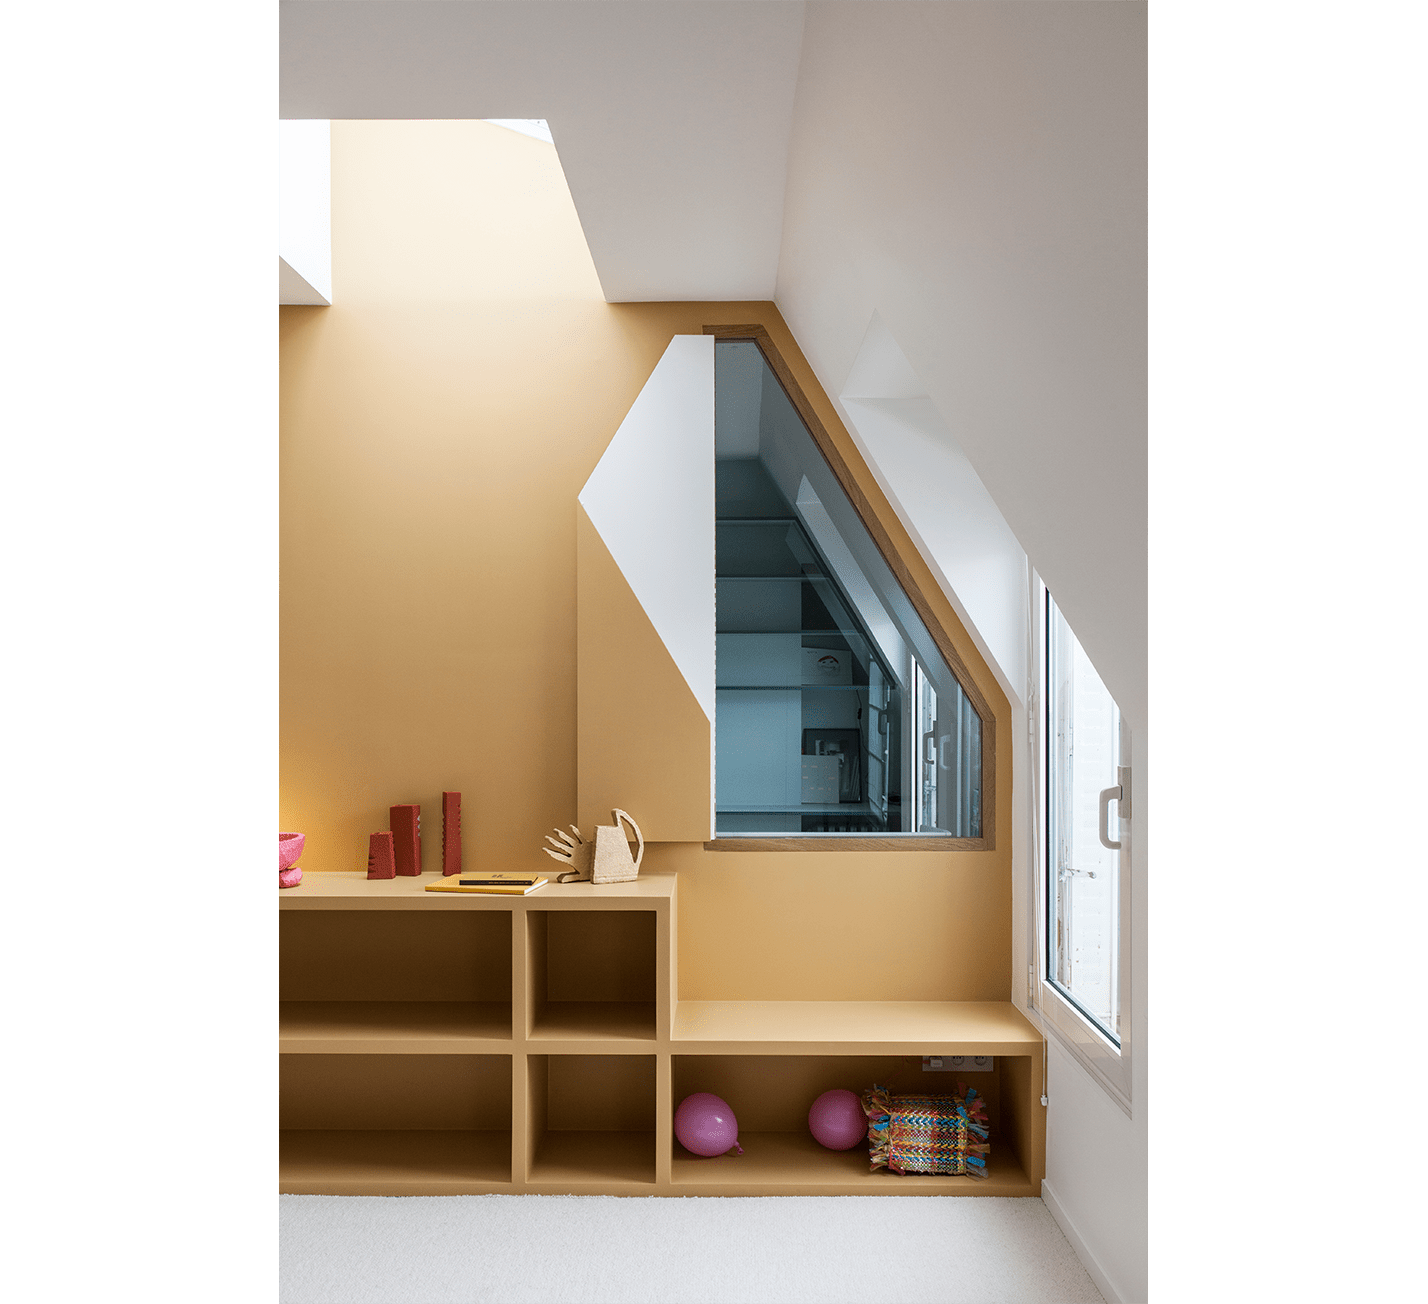 Projet-Arlequin-Atelier-Steve-Pauline-Borgia-Architecture-interieur-06-min